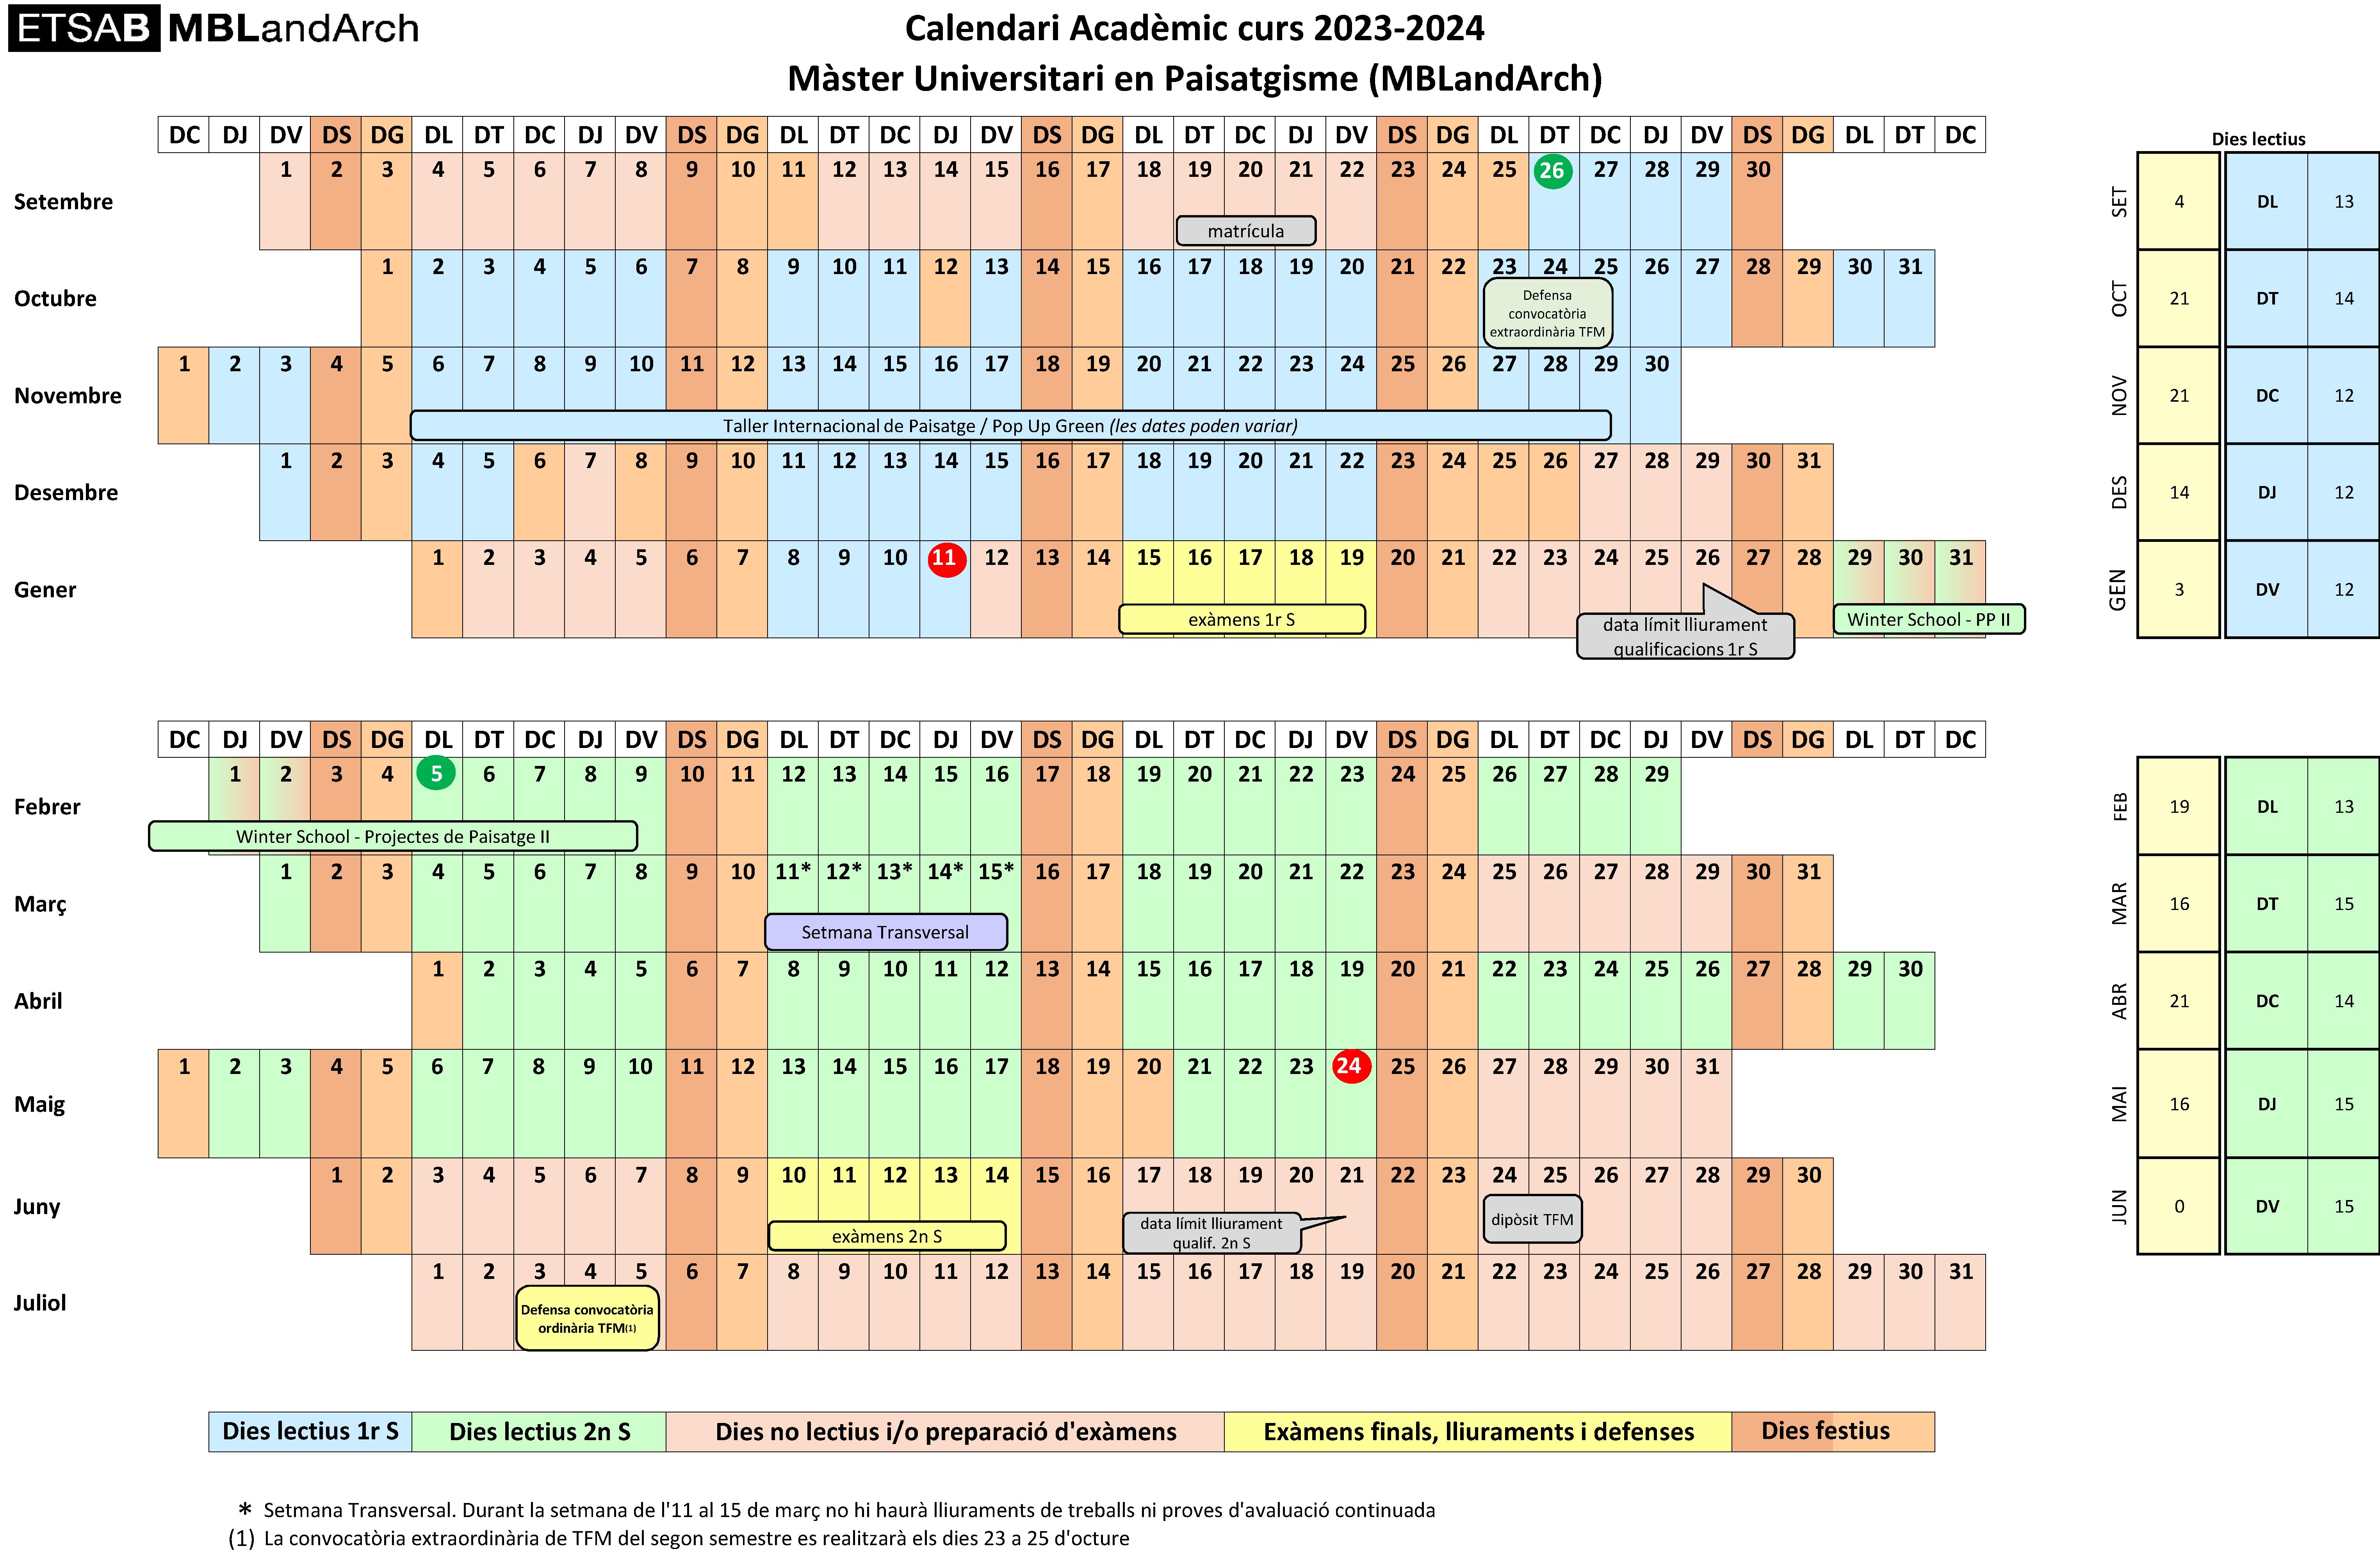 calendari academic mblandarch 2021-22